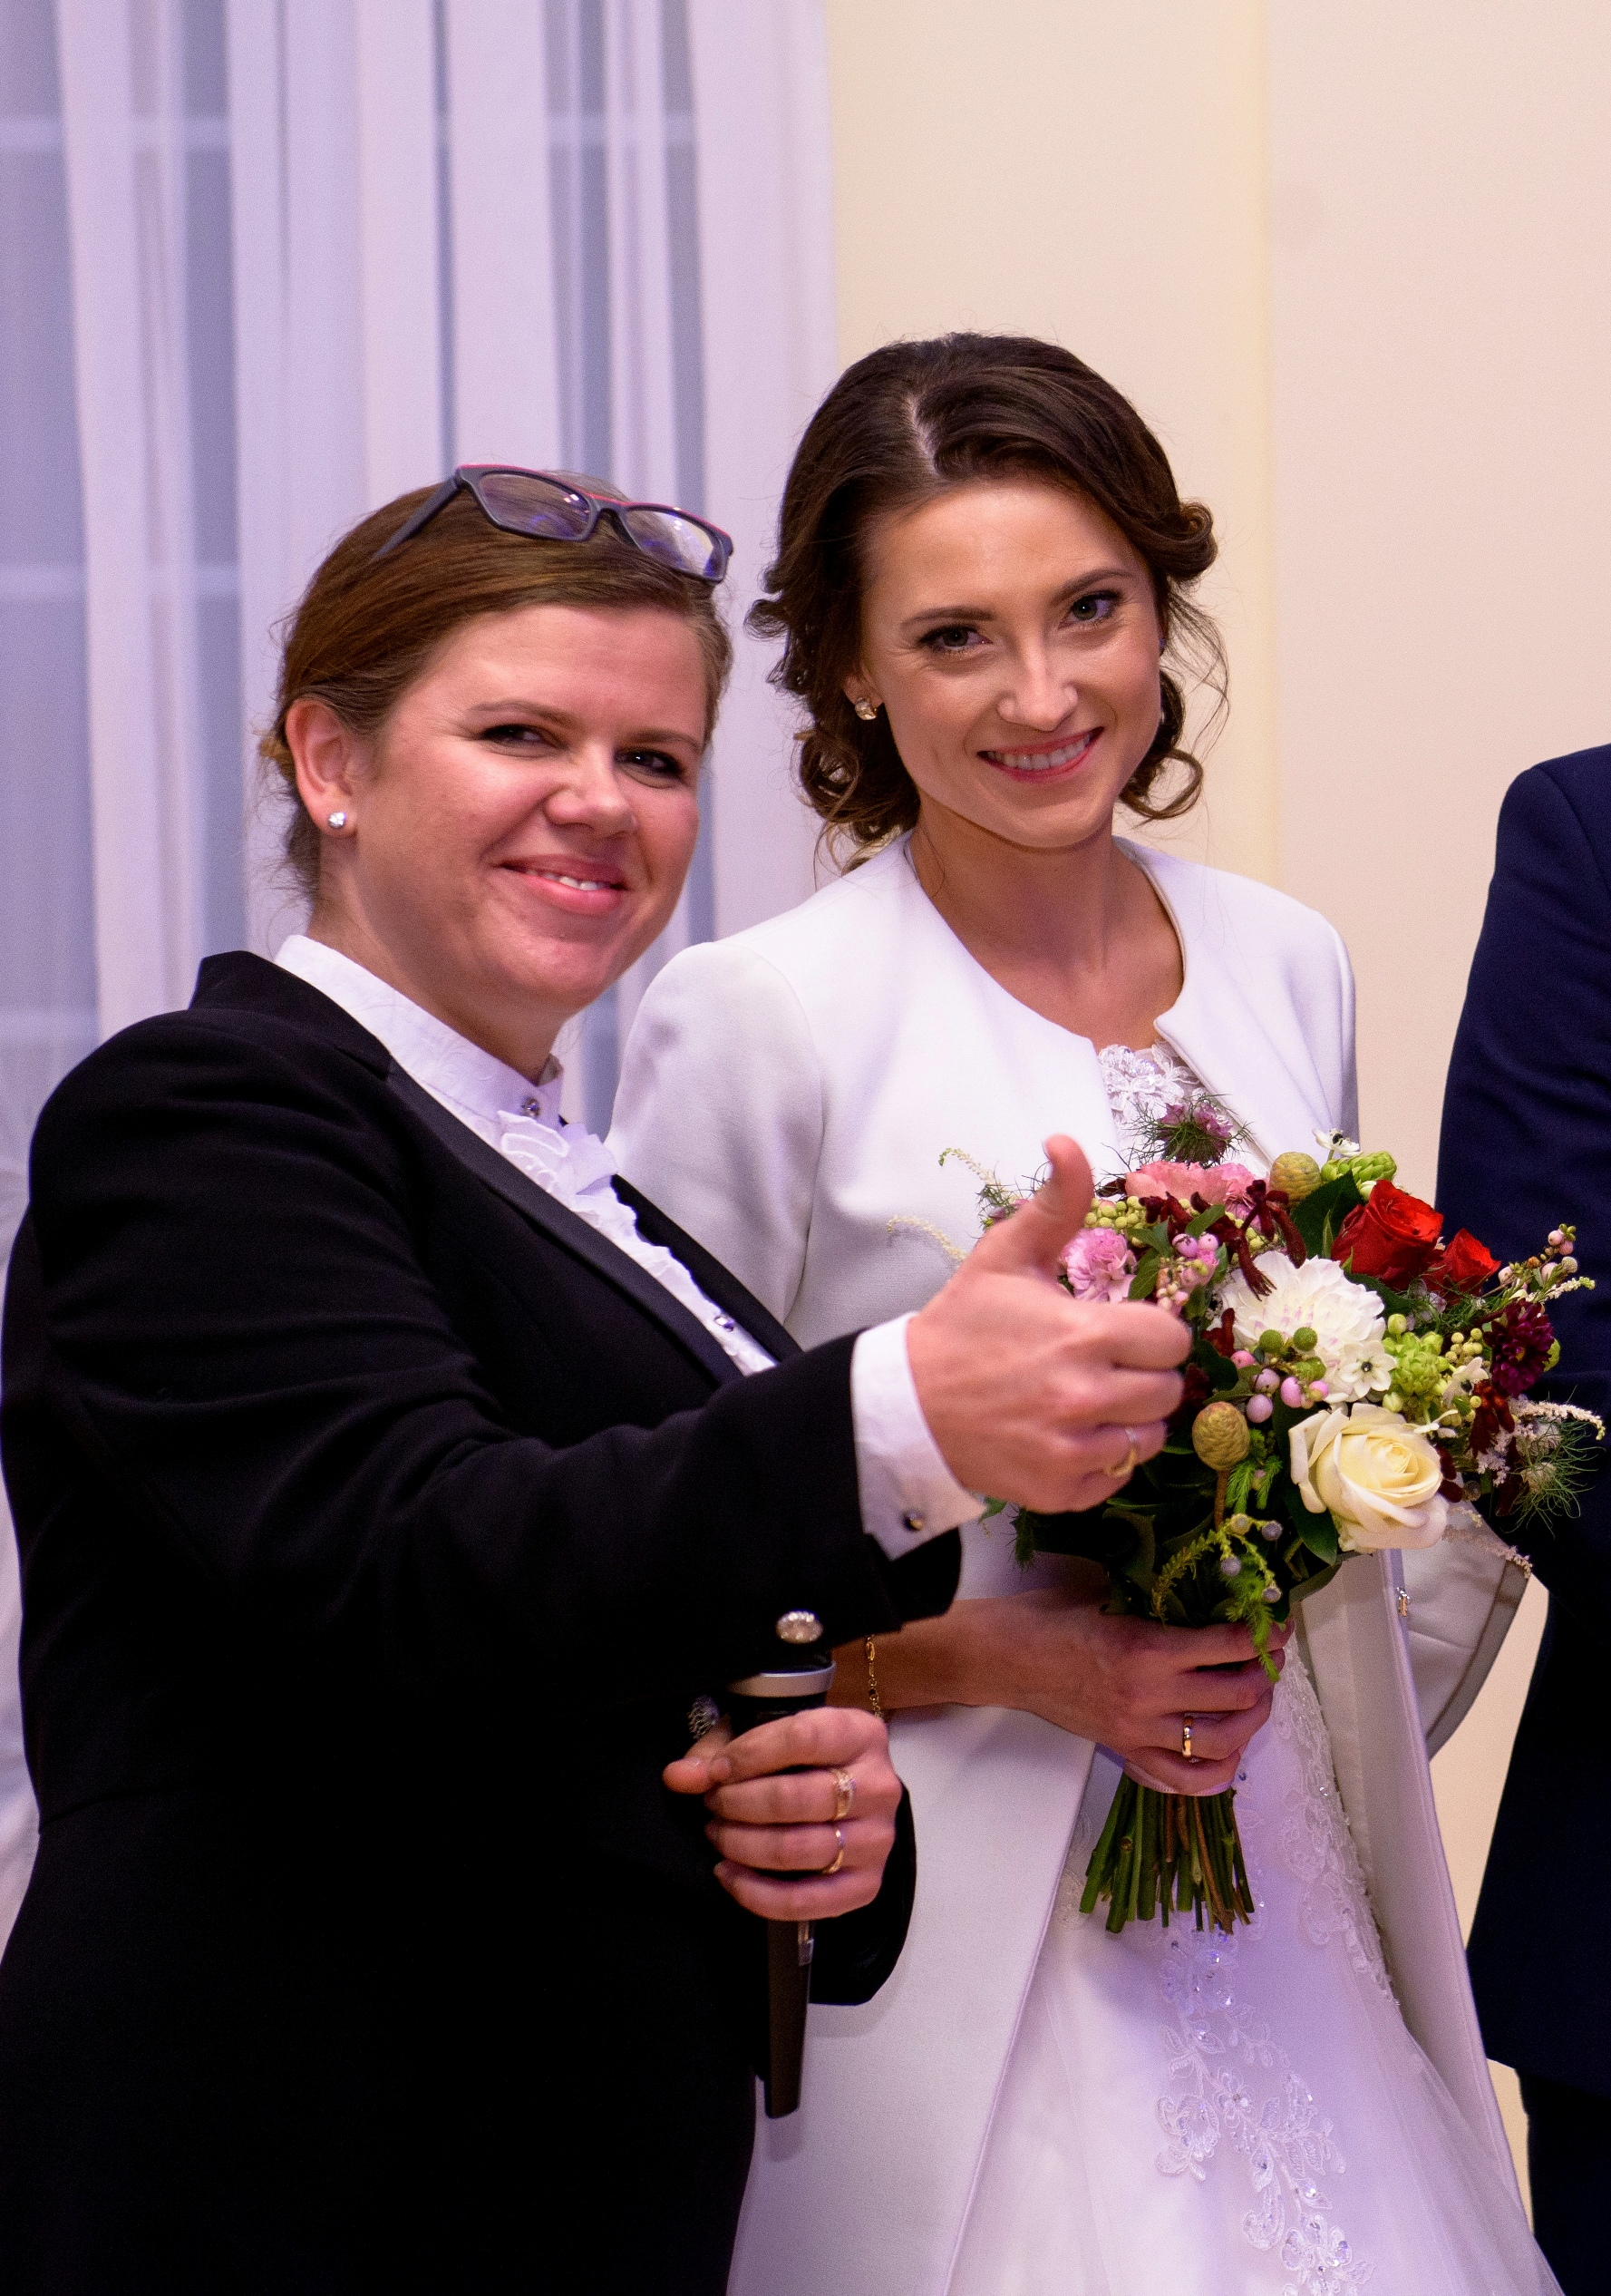 Slub Anny i Piotra